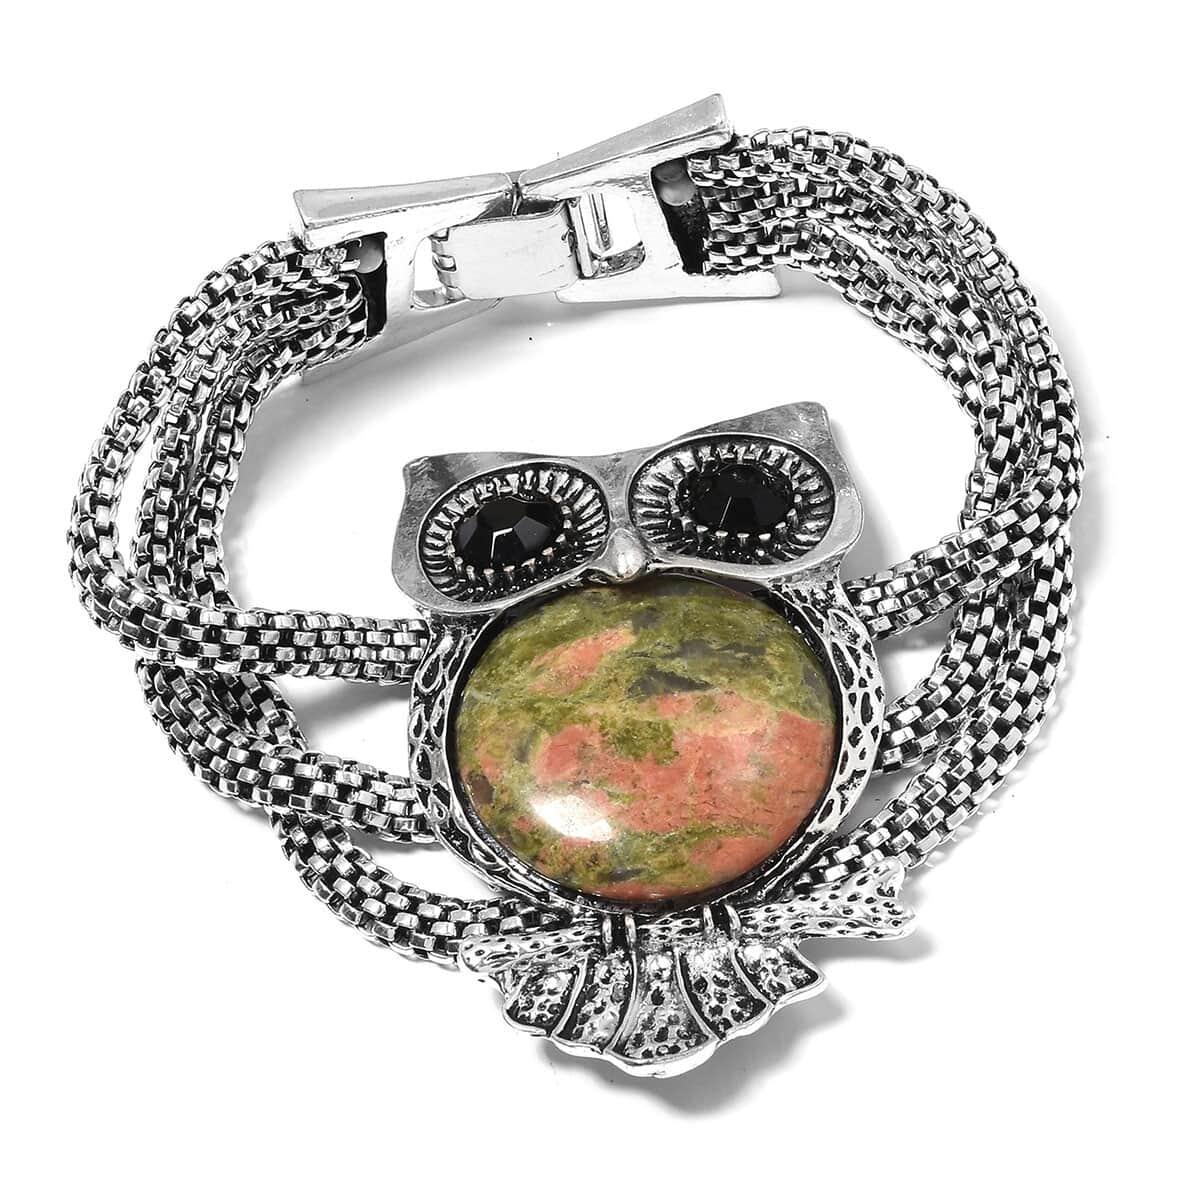 Unakite Black Austrian Crystal Owl Bracelet In Oxidized Silvertone 8 25 107 00 Ctw